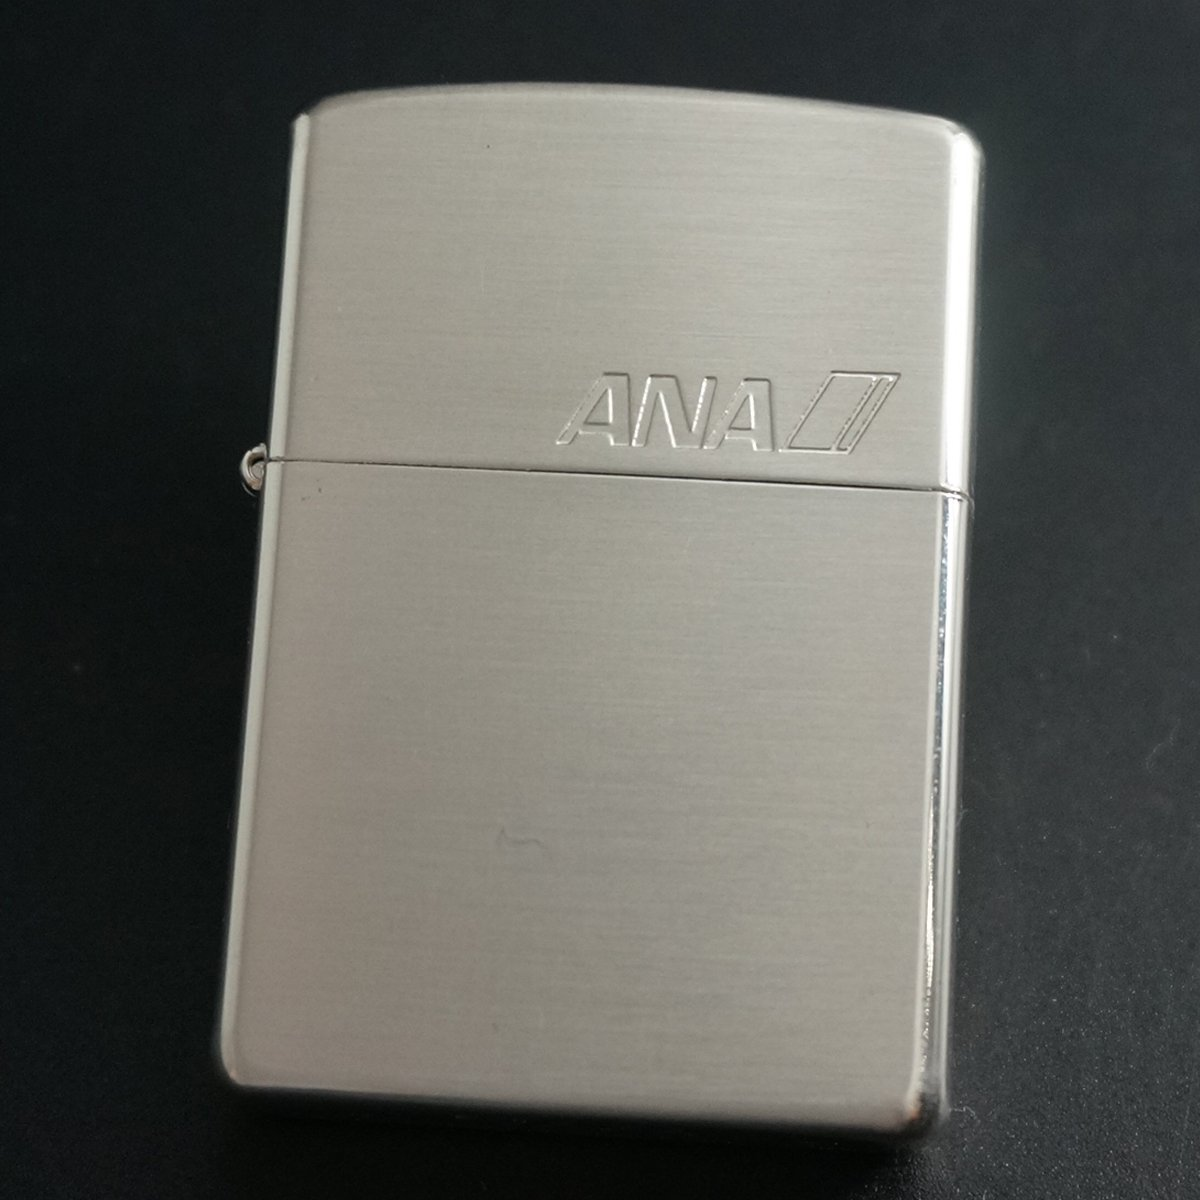 zippo ANA Sサテーナ 2000年製造 B06XZYRNQW